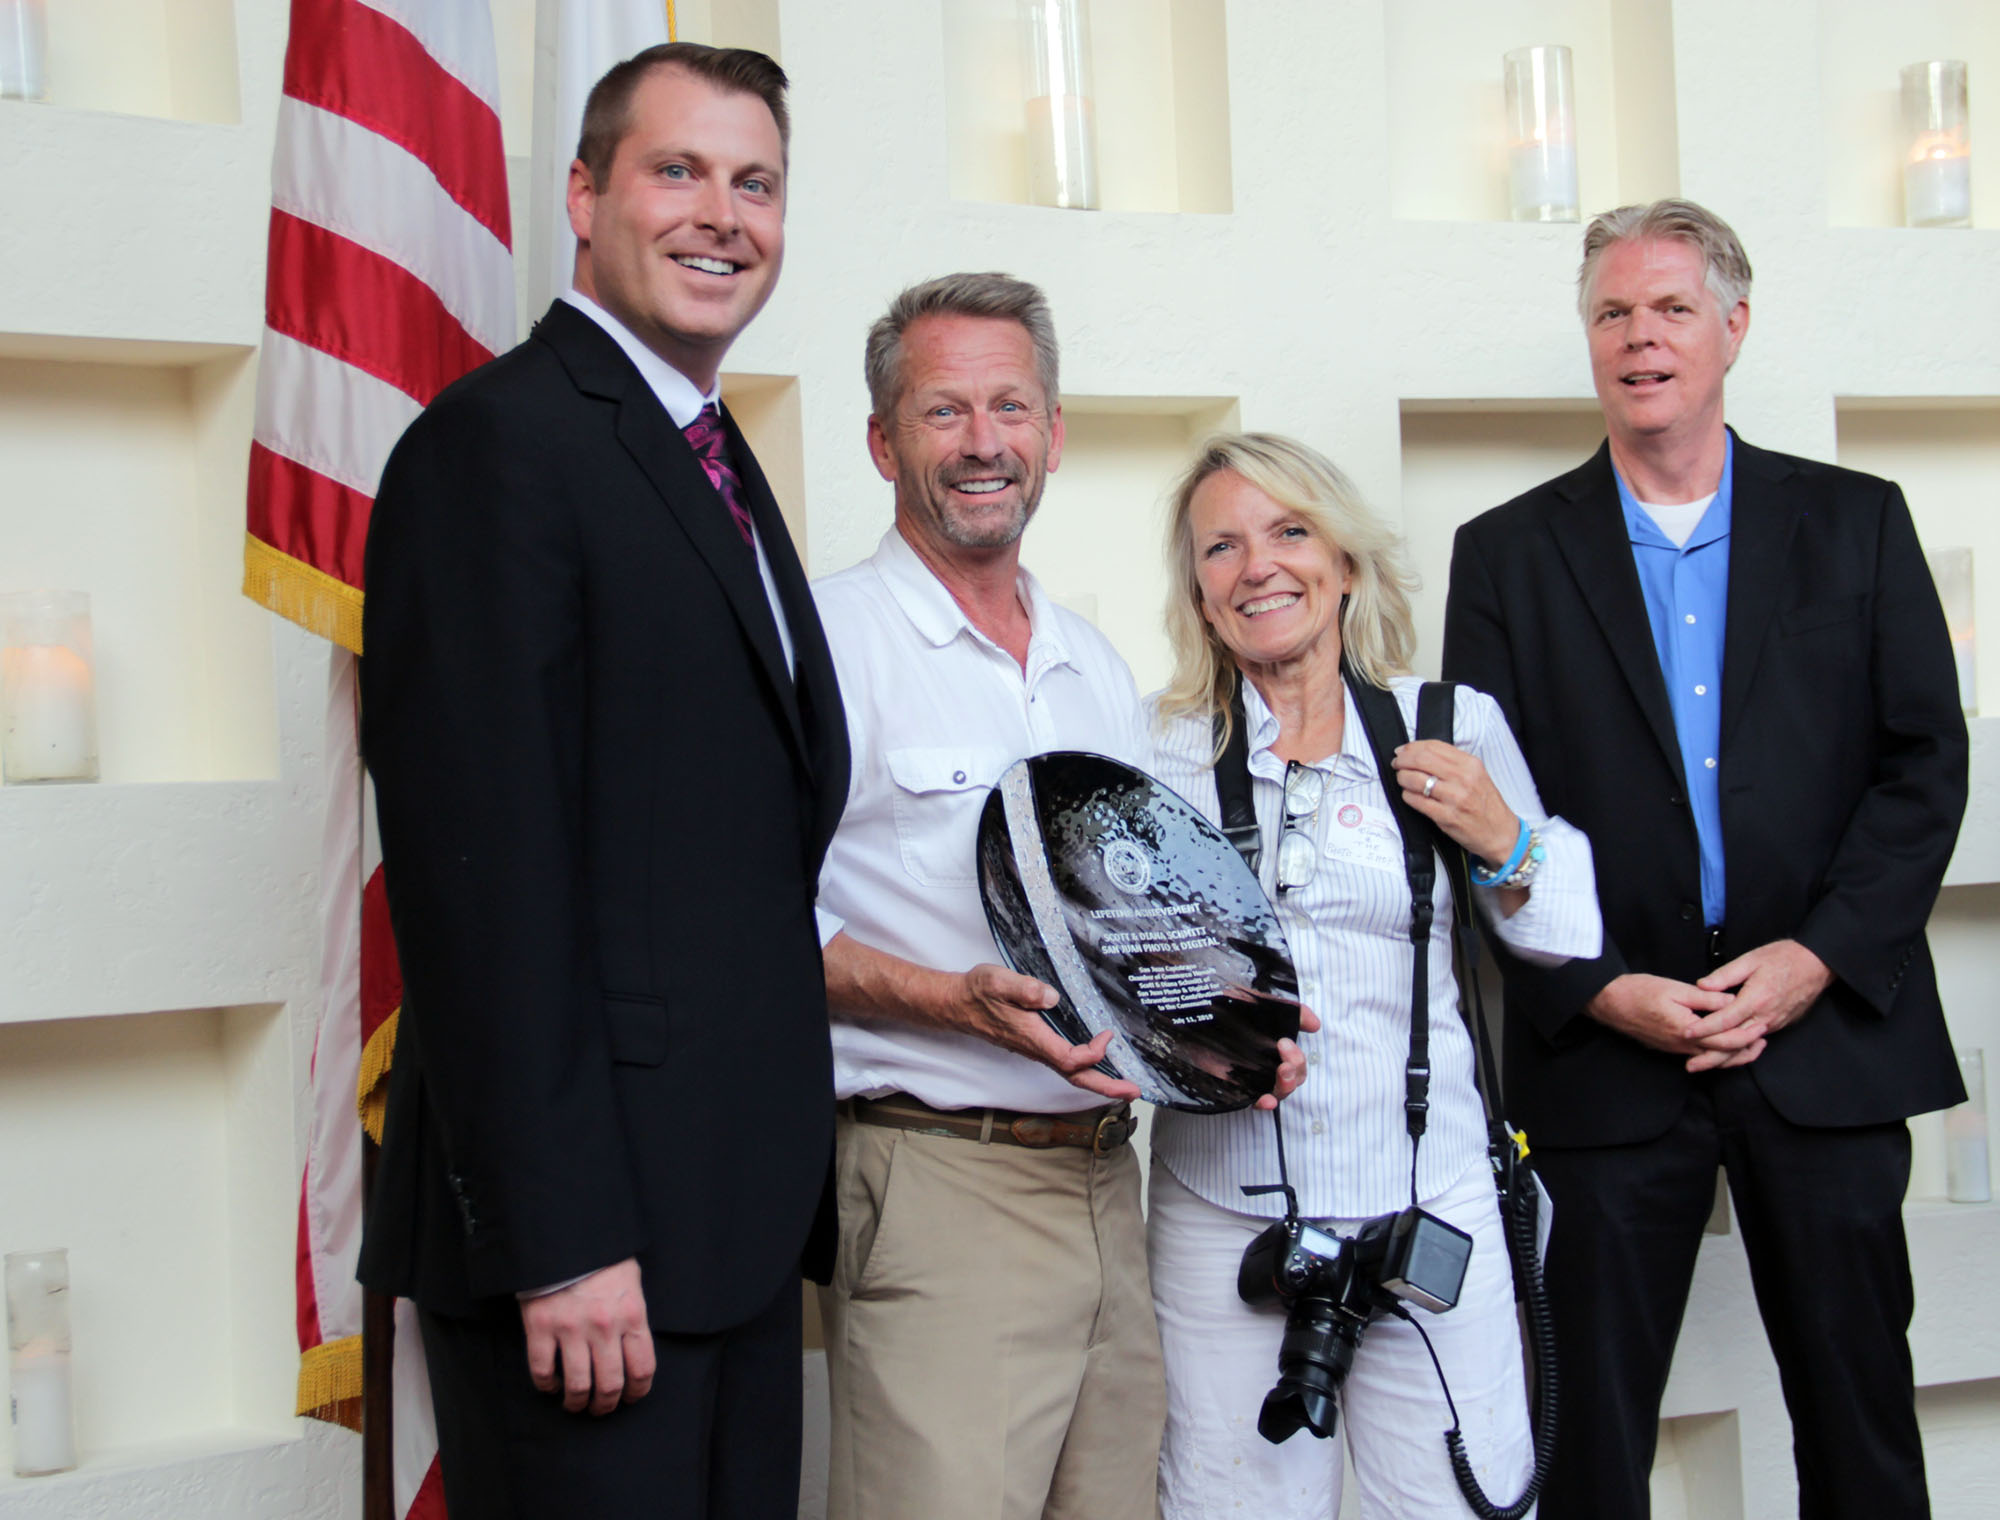 San Juan Capistrano Chamber of Commerce CEO George Peppas III (far left) presents the Lifetime Achievement Award to Scott and Diana Schmitt alongside Jim Taylor on July 11. Photo: Shawn Raymundo